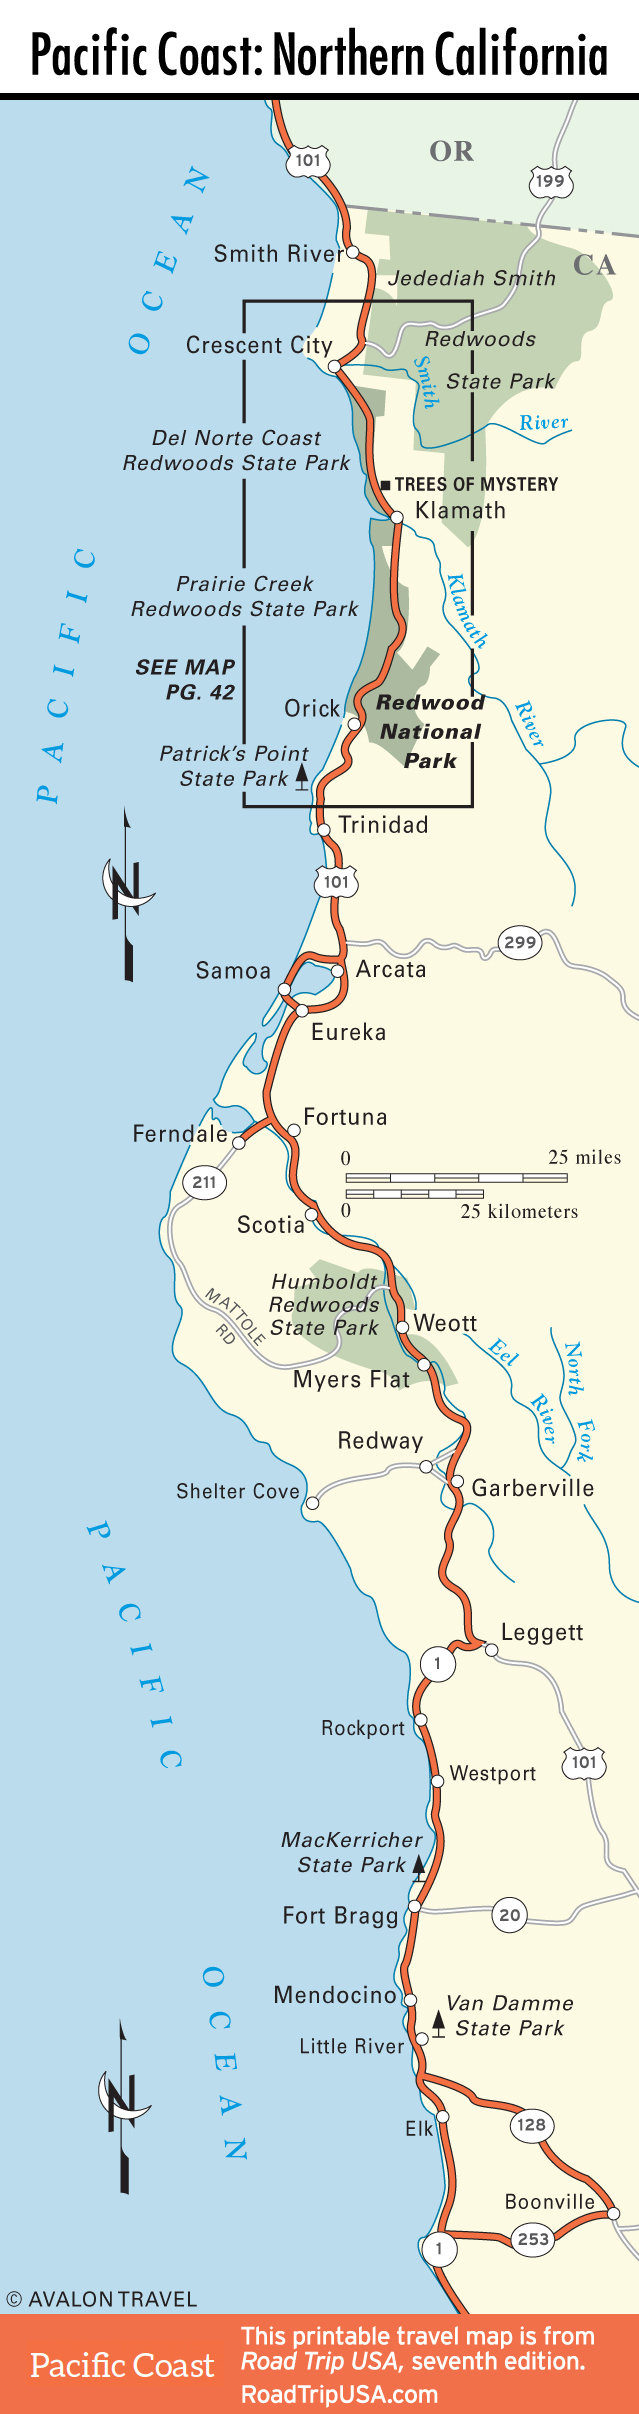 Map Of Highway 101 In California - Klipy - California Coast Map 101